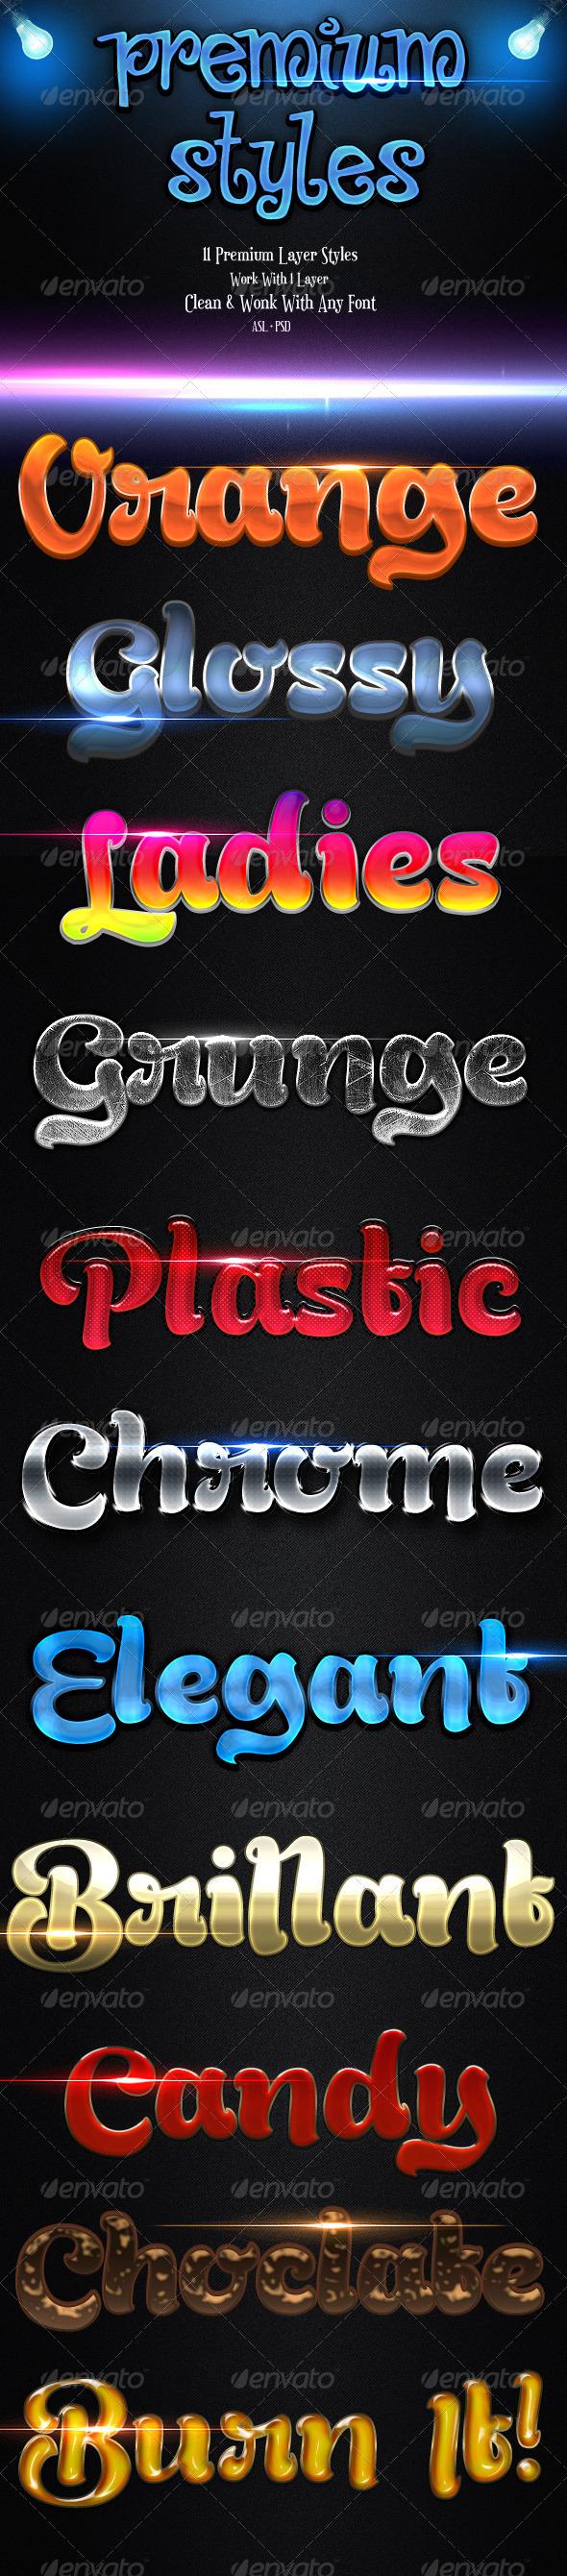 GraphicRiver Premium Styles 3866843